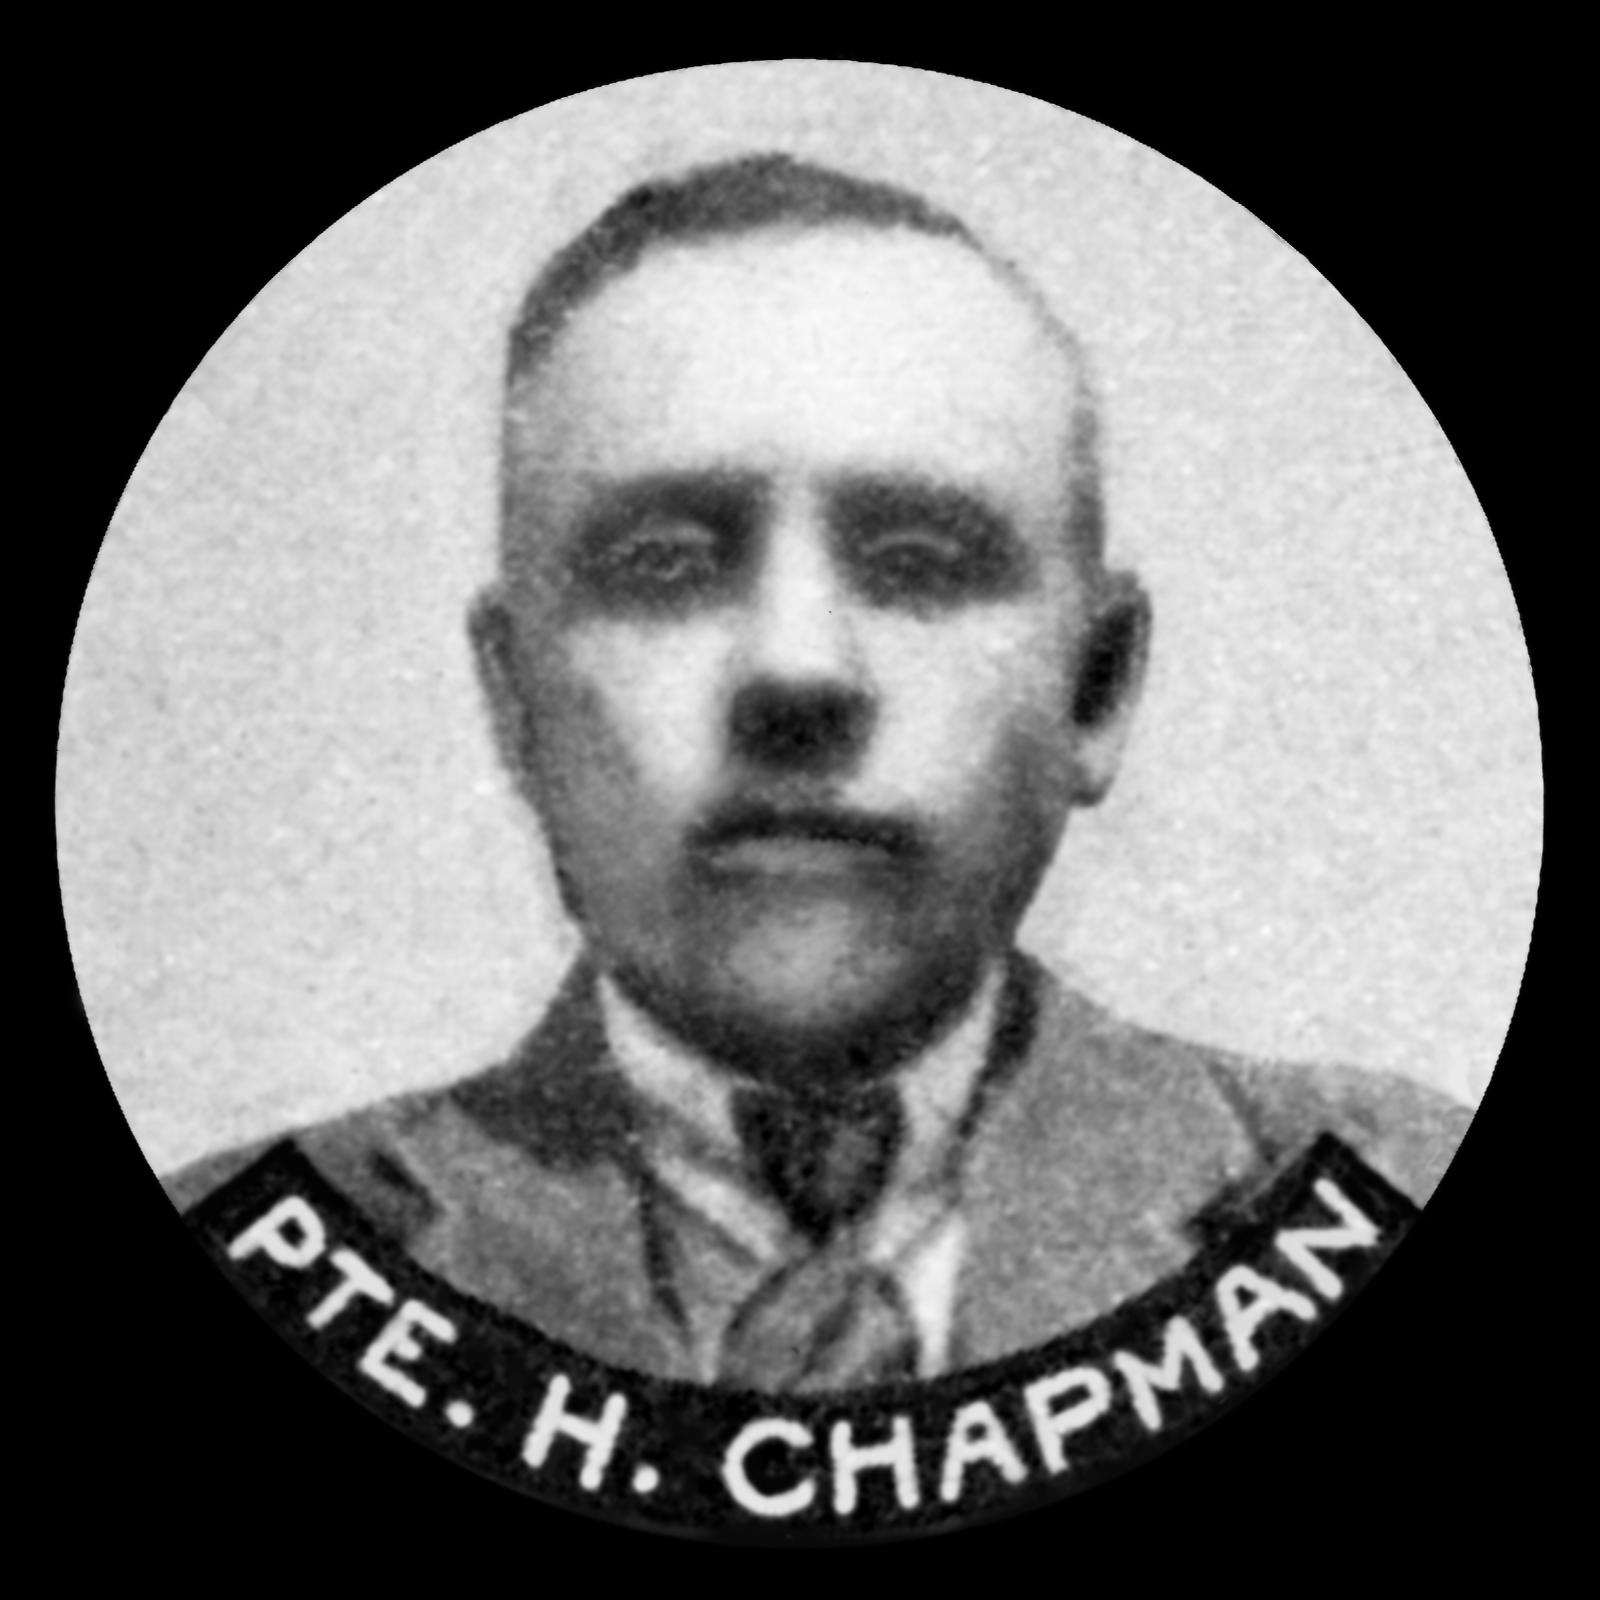 CHAPMAN Henry